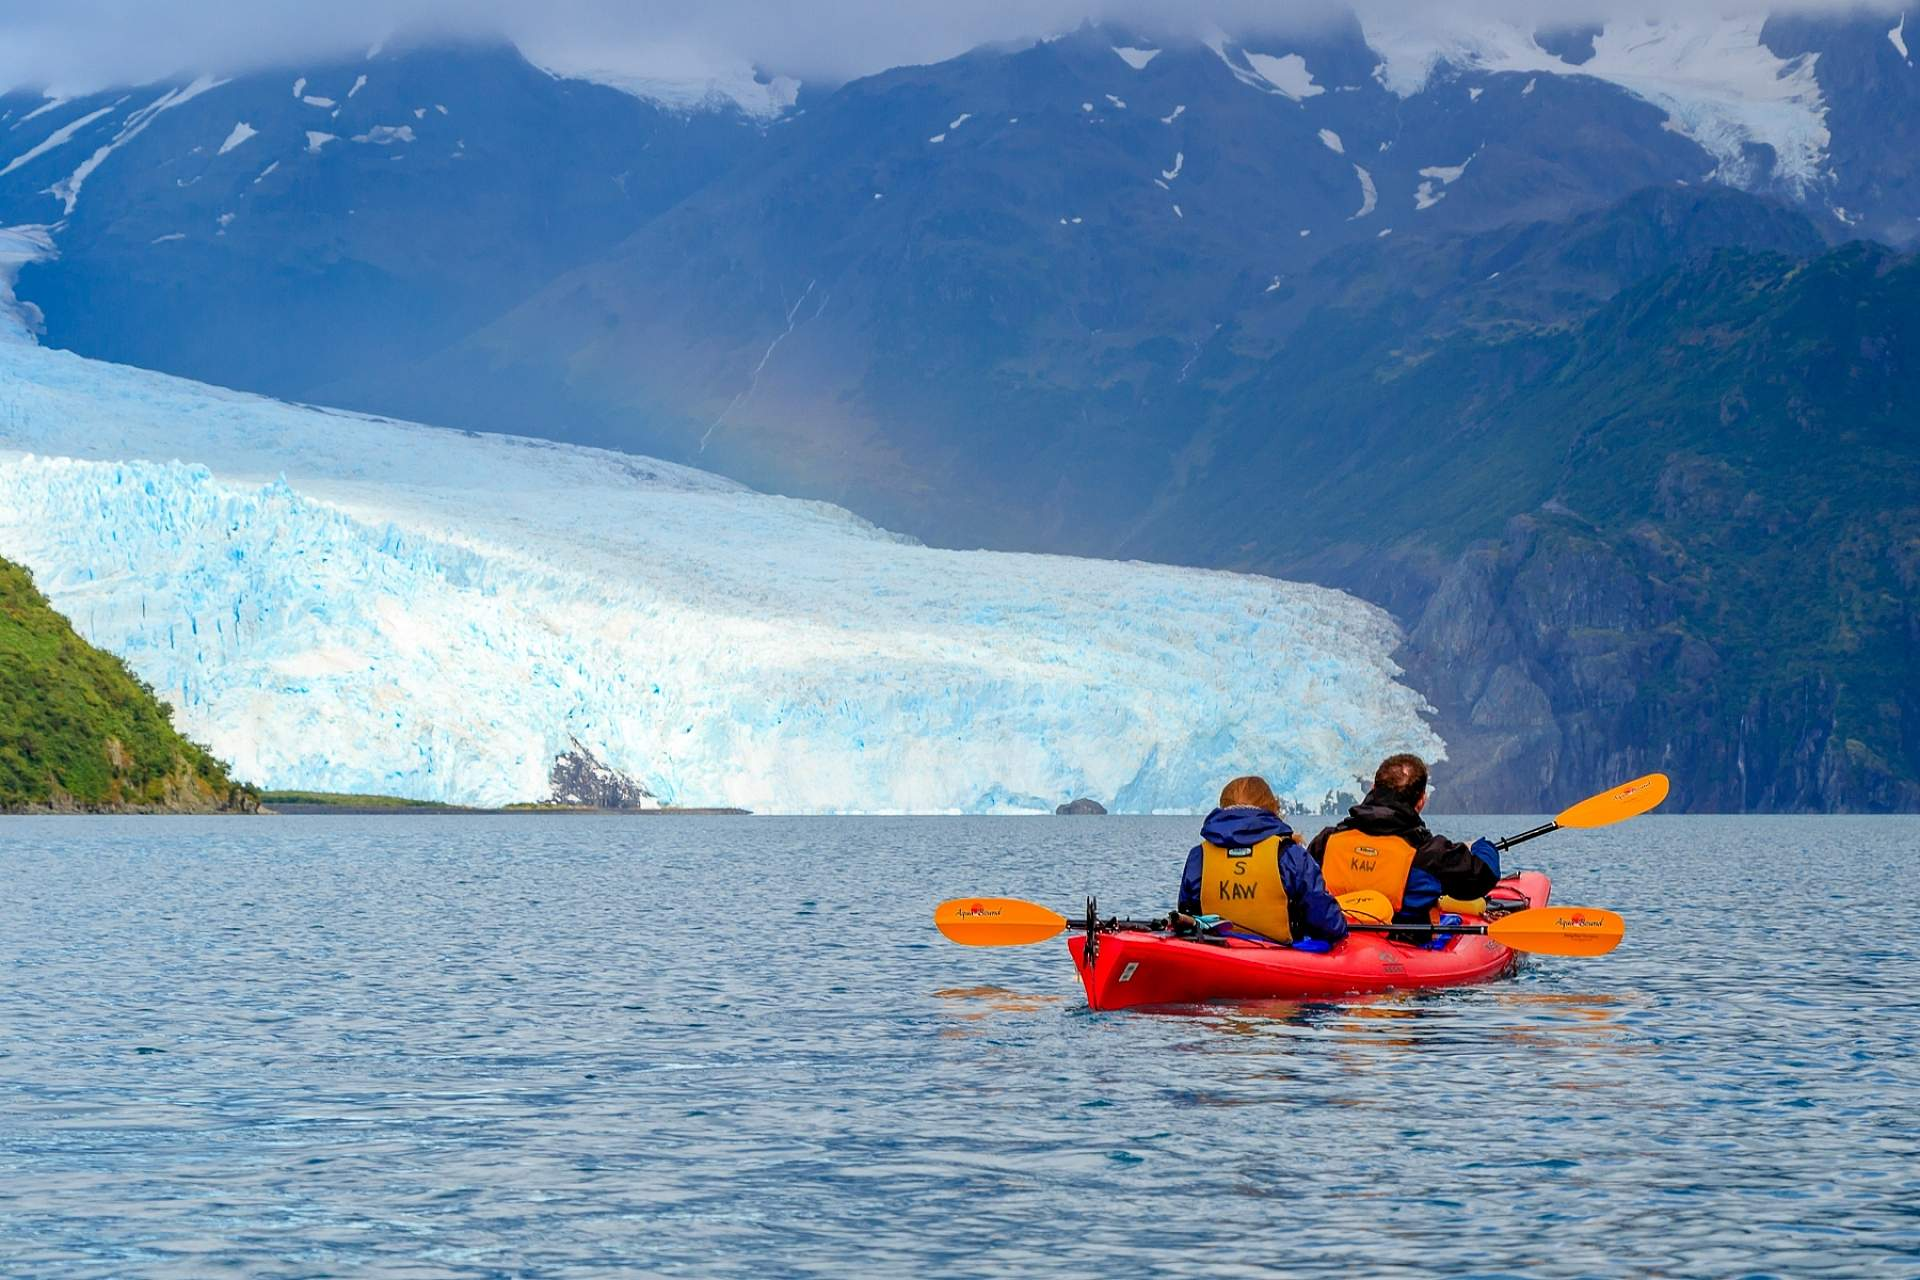 Kayak in front of Aialik Glacier in Kenai Fjords National Park